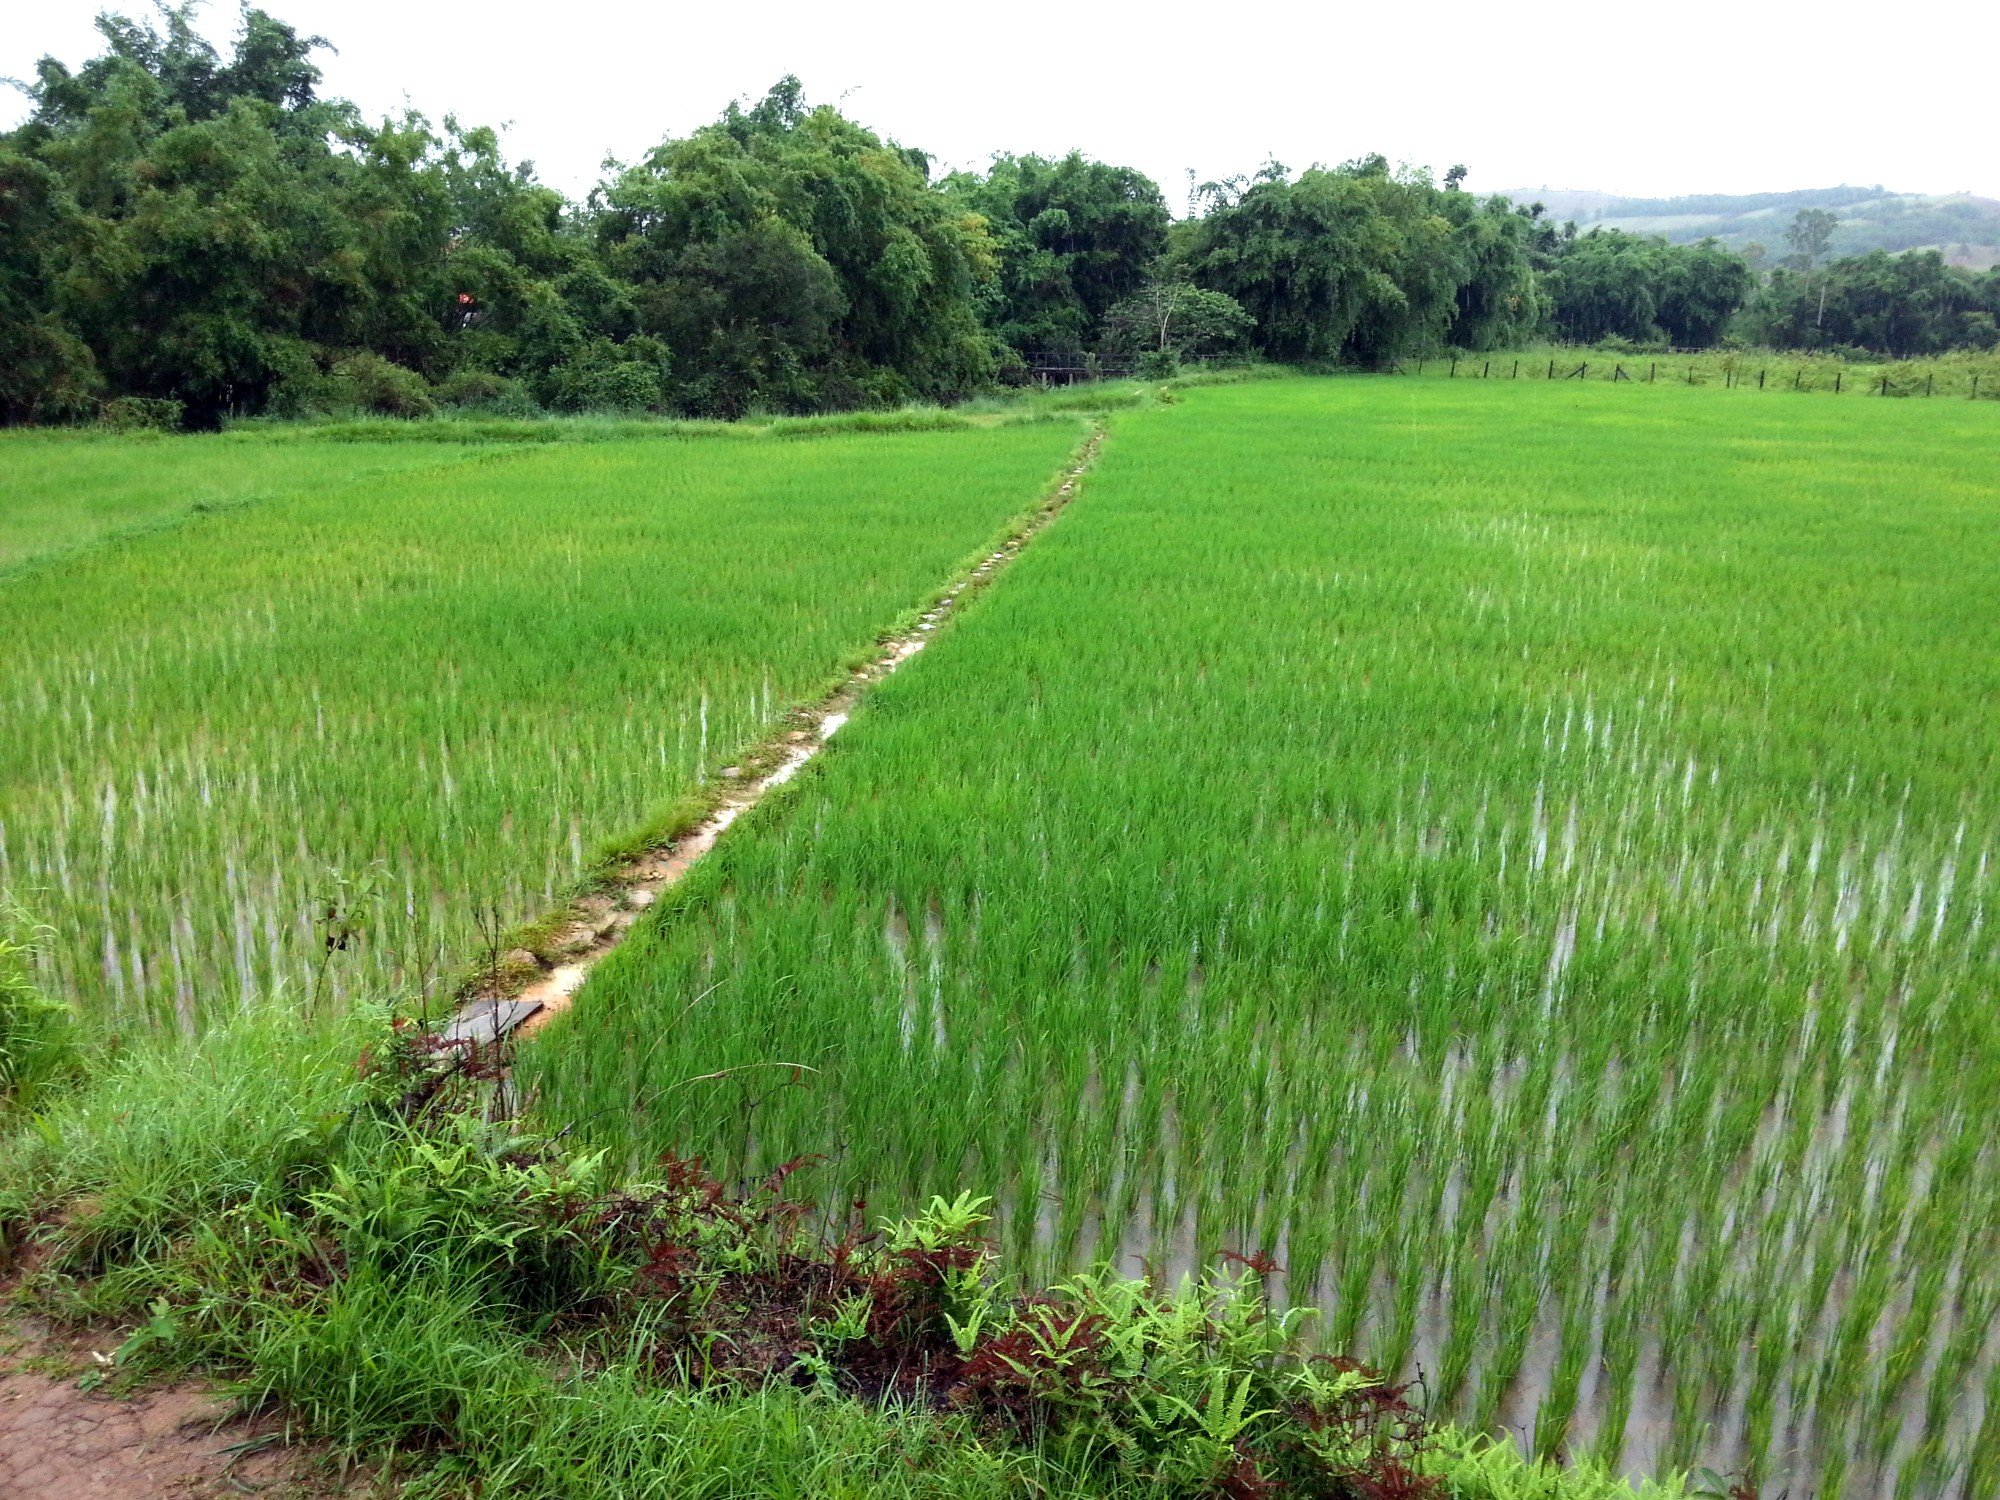 Crossing through the rice paddies at Jar Site 3